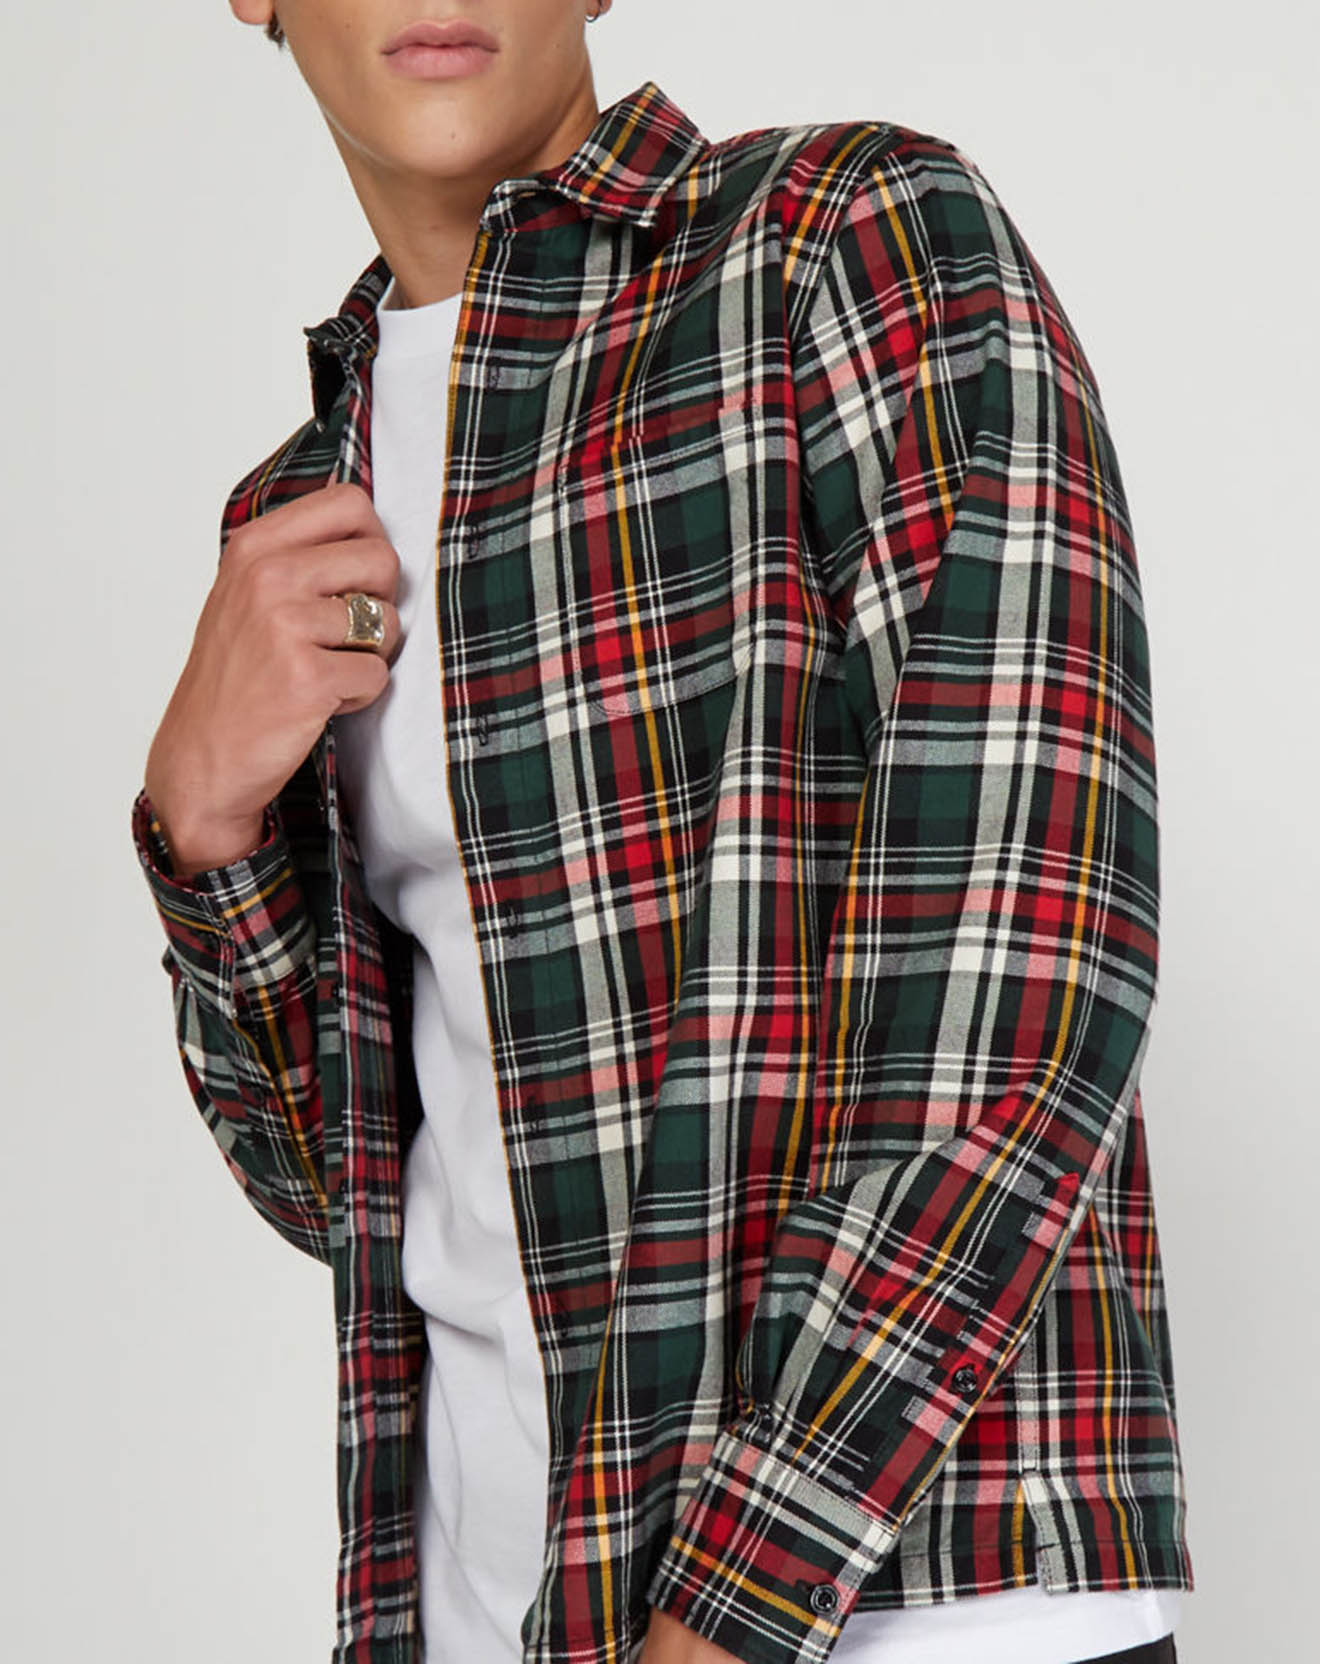 Chemise à carreaux rouge/vert - Replay - Modalova